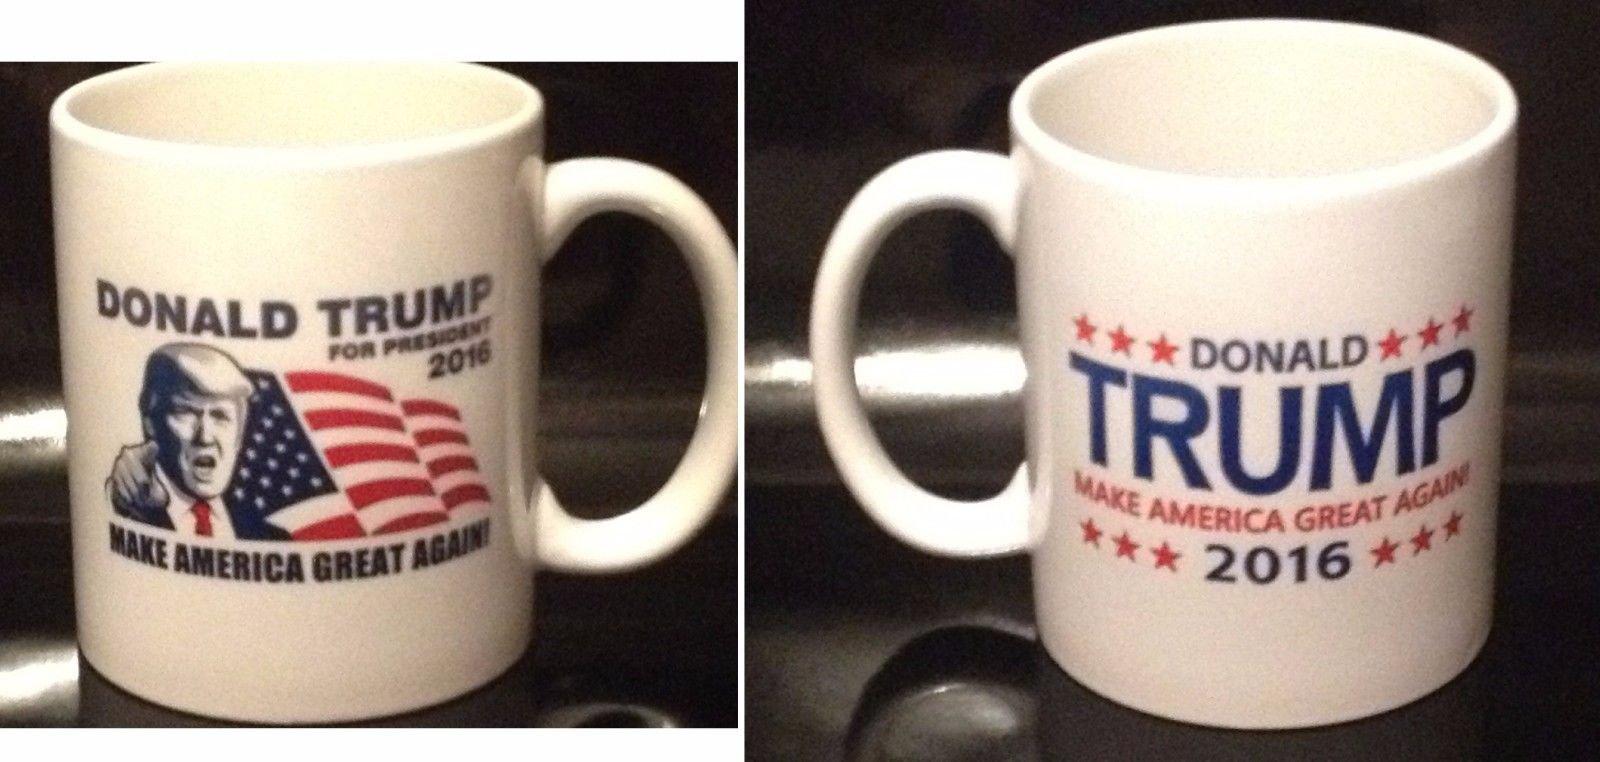 Donald Trump 2016 Coffee Mug Make America Great Again (2 Sided Design)